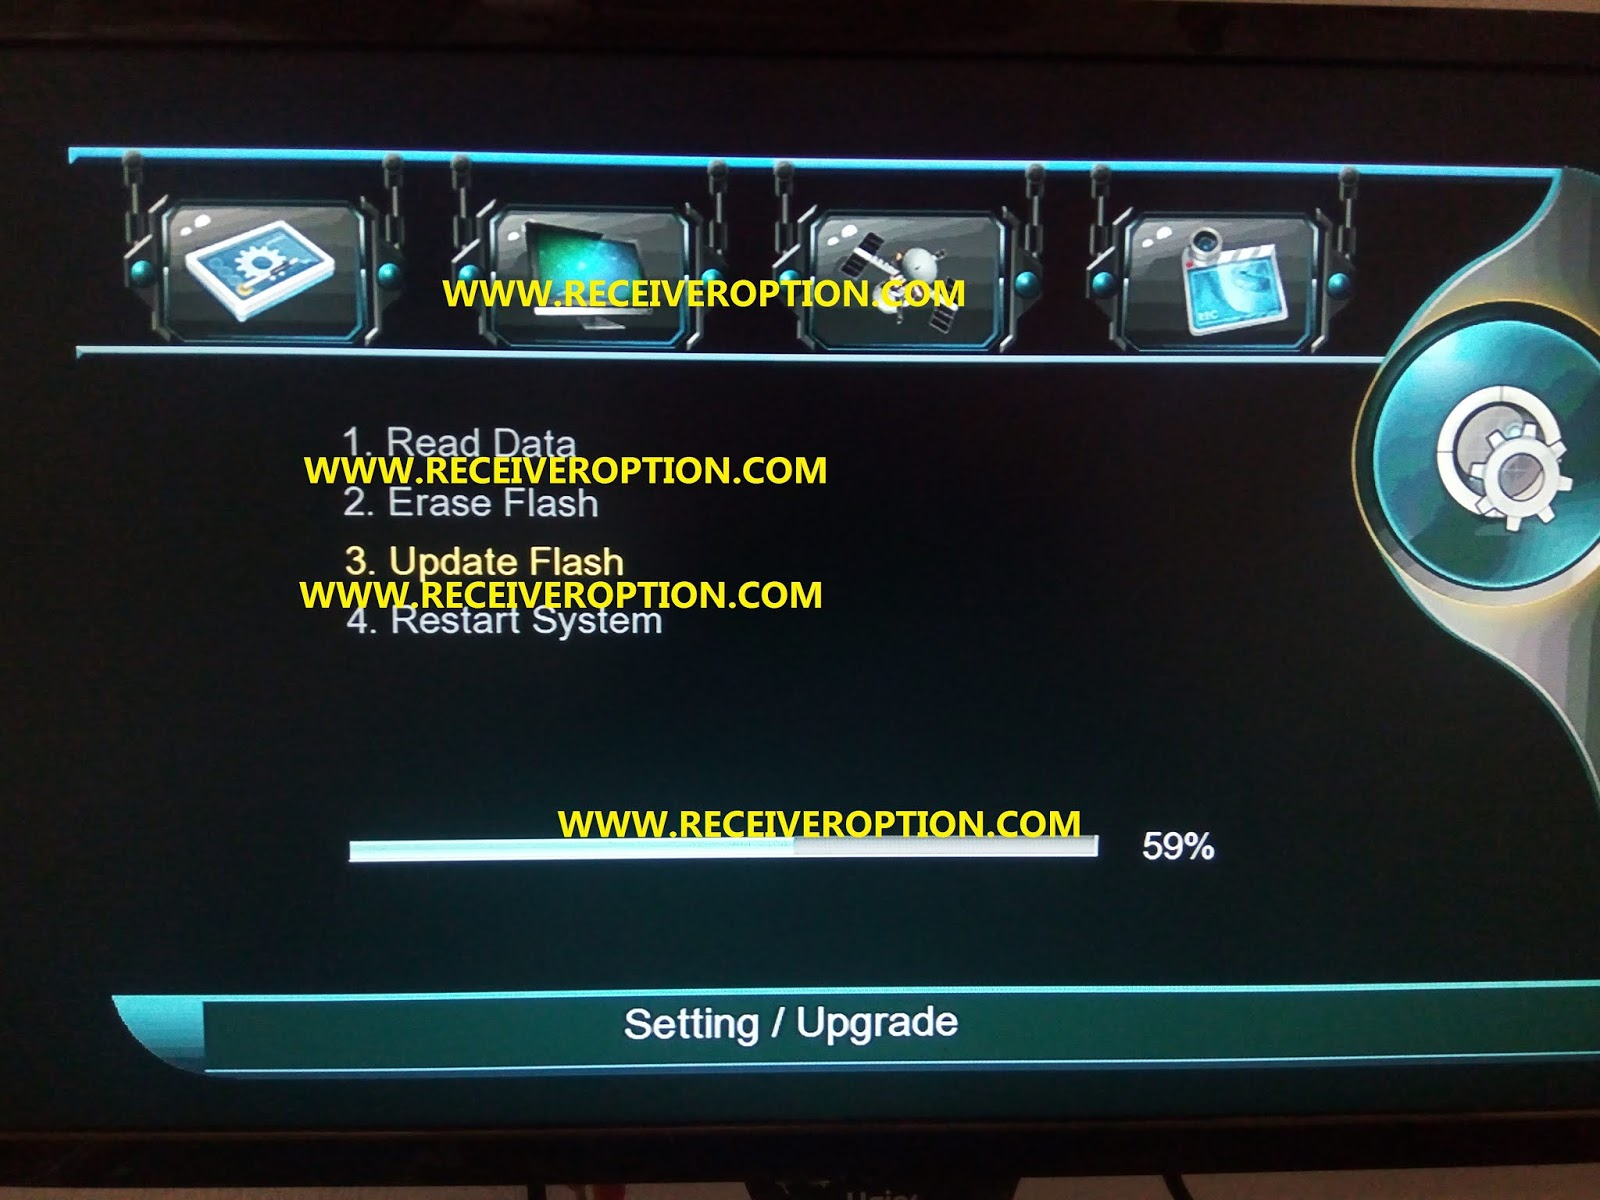 RECEIVER SOFTWARE: COBOX HD RECEIVER POWERVU KEY NEW SOFTWARE